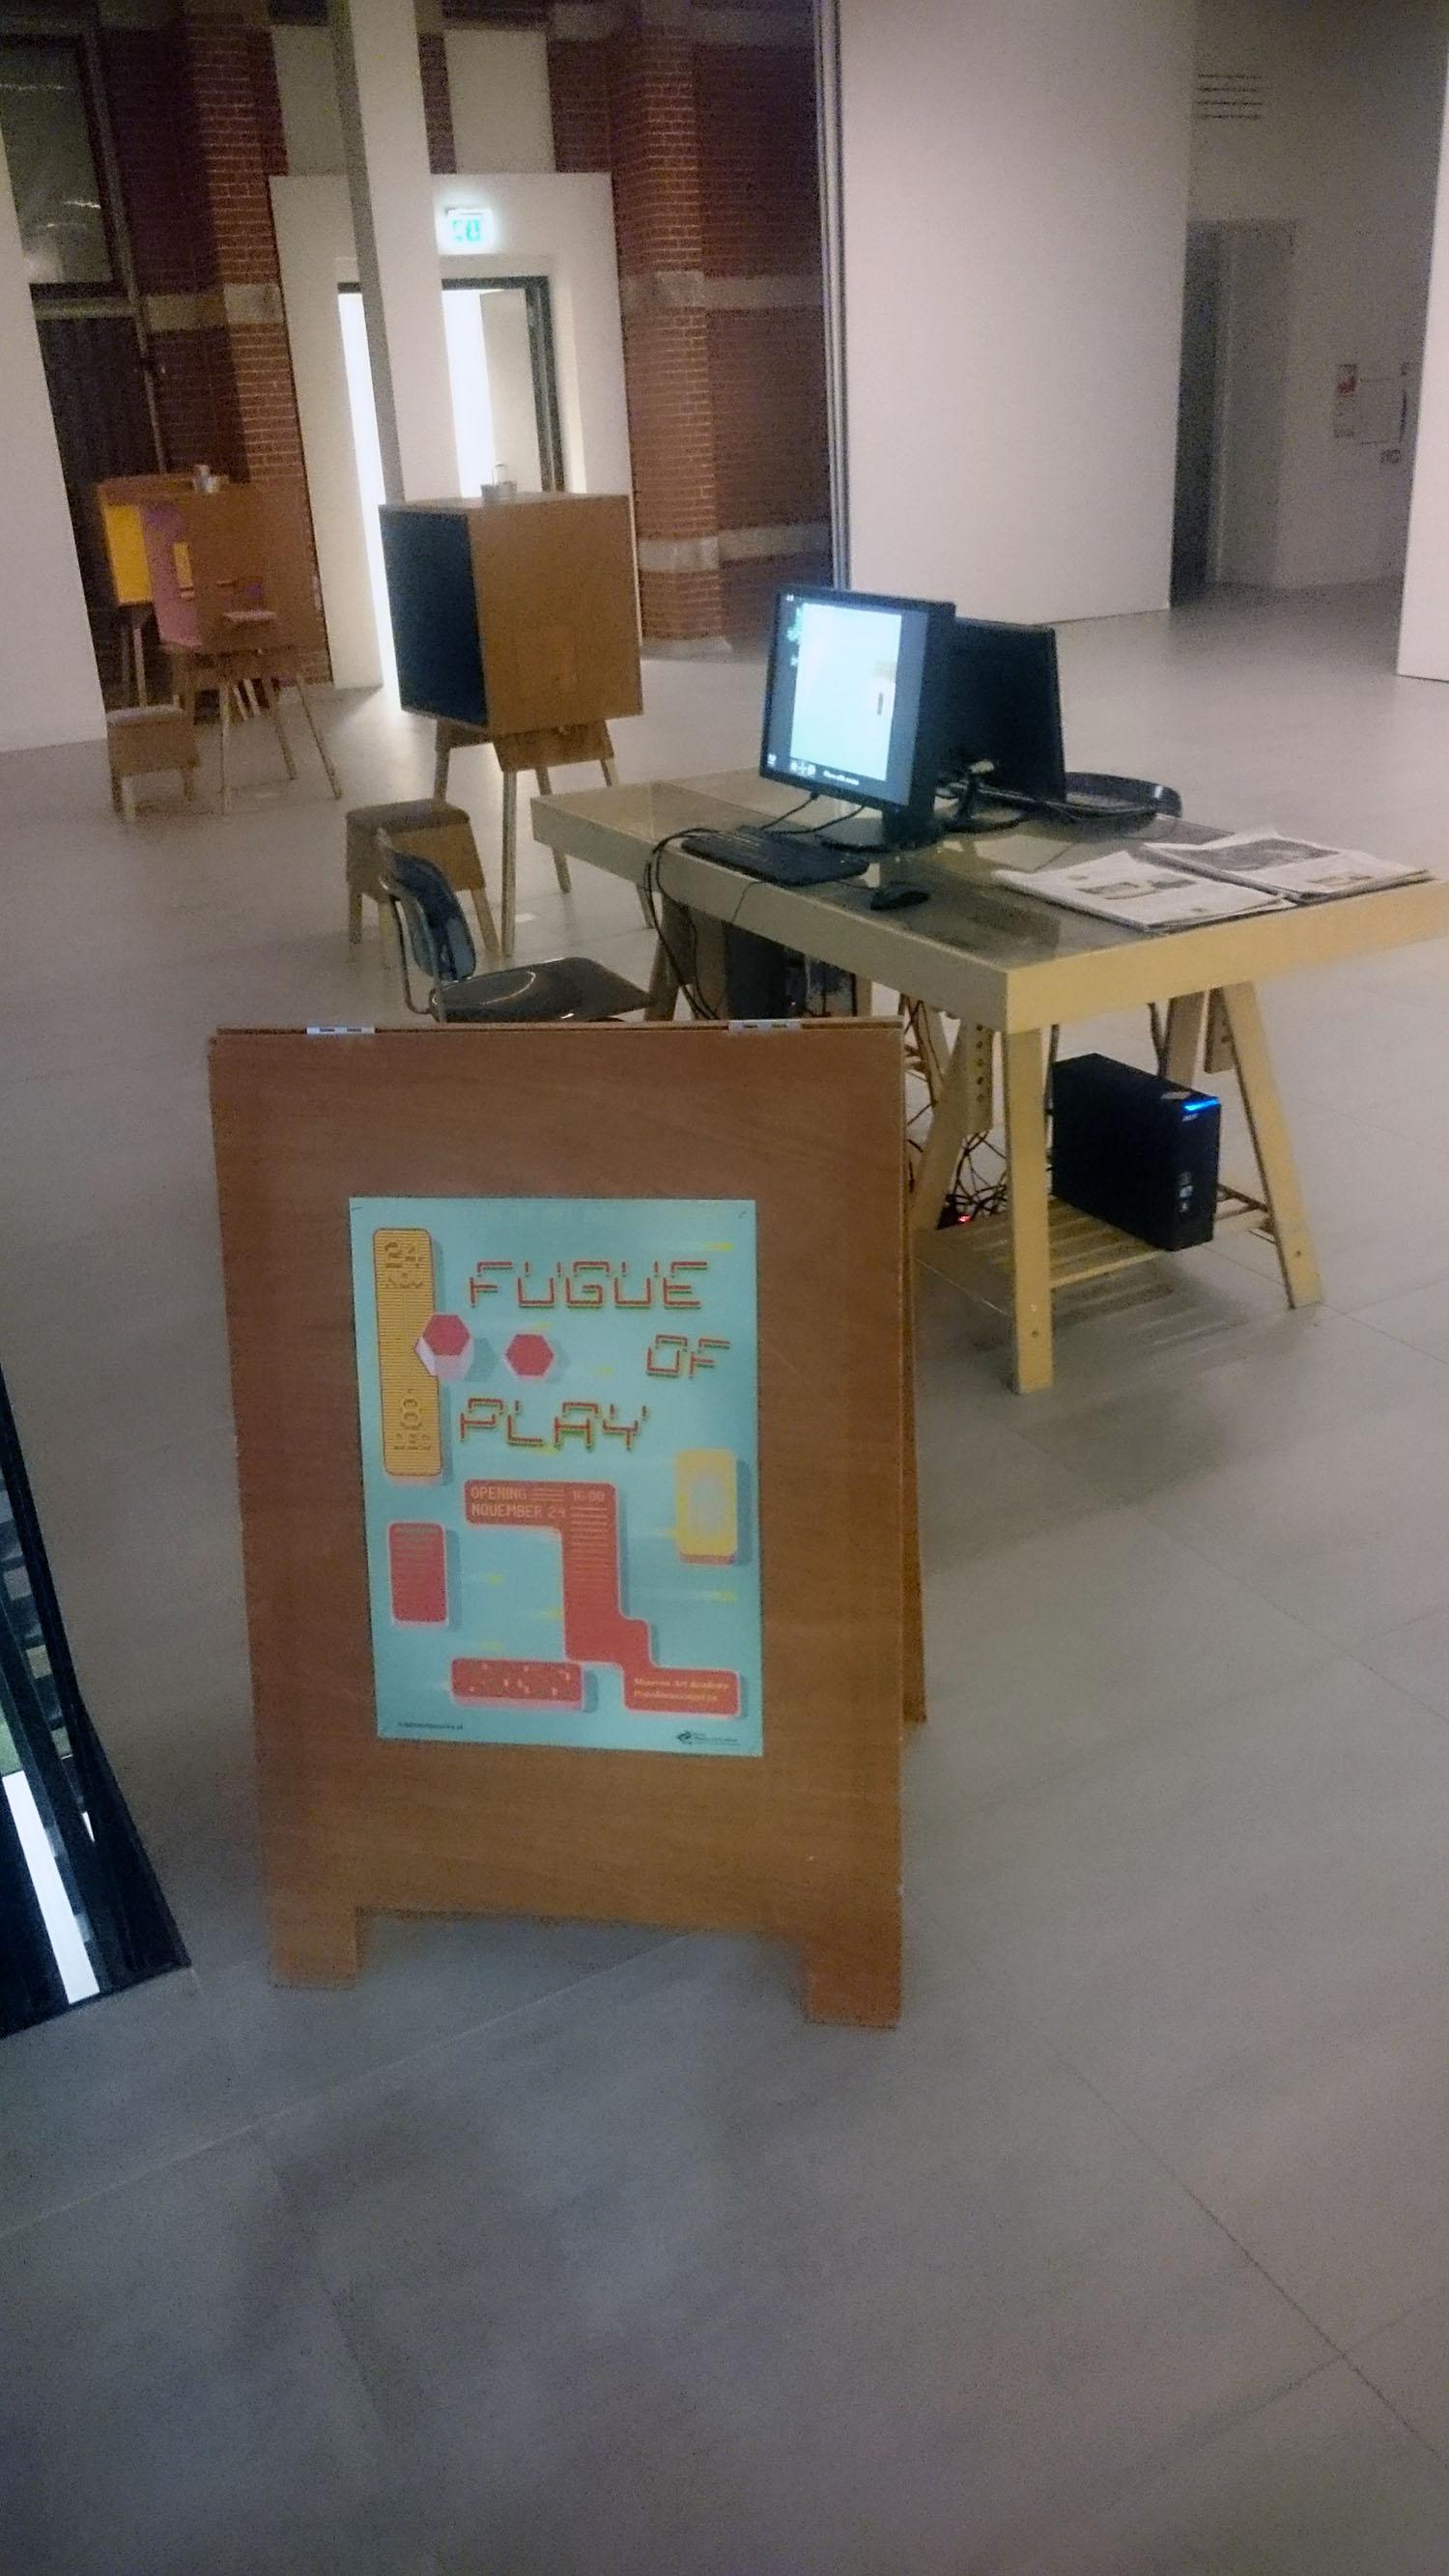 DSC 0012 Curatorial